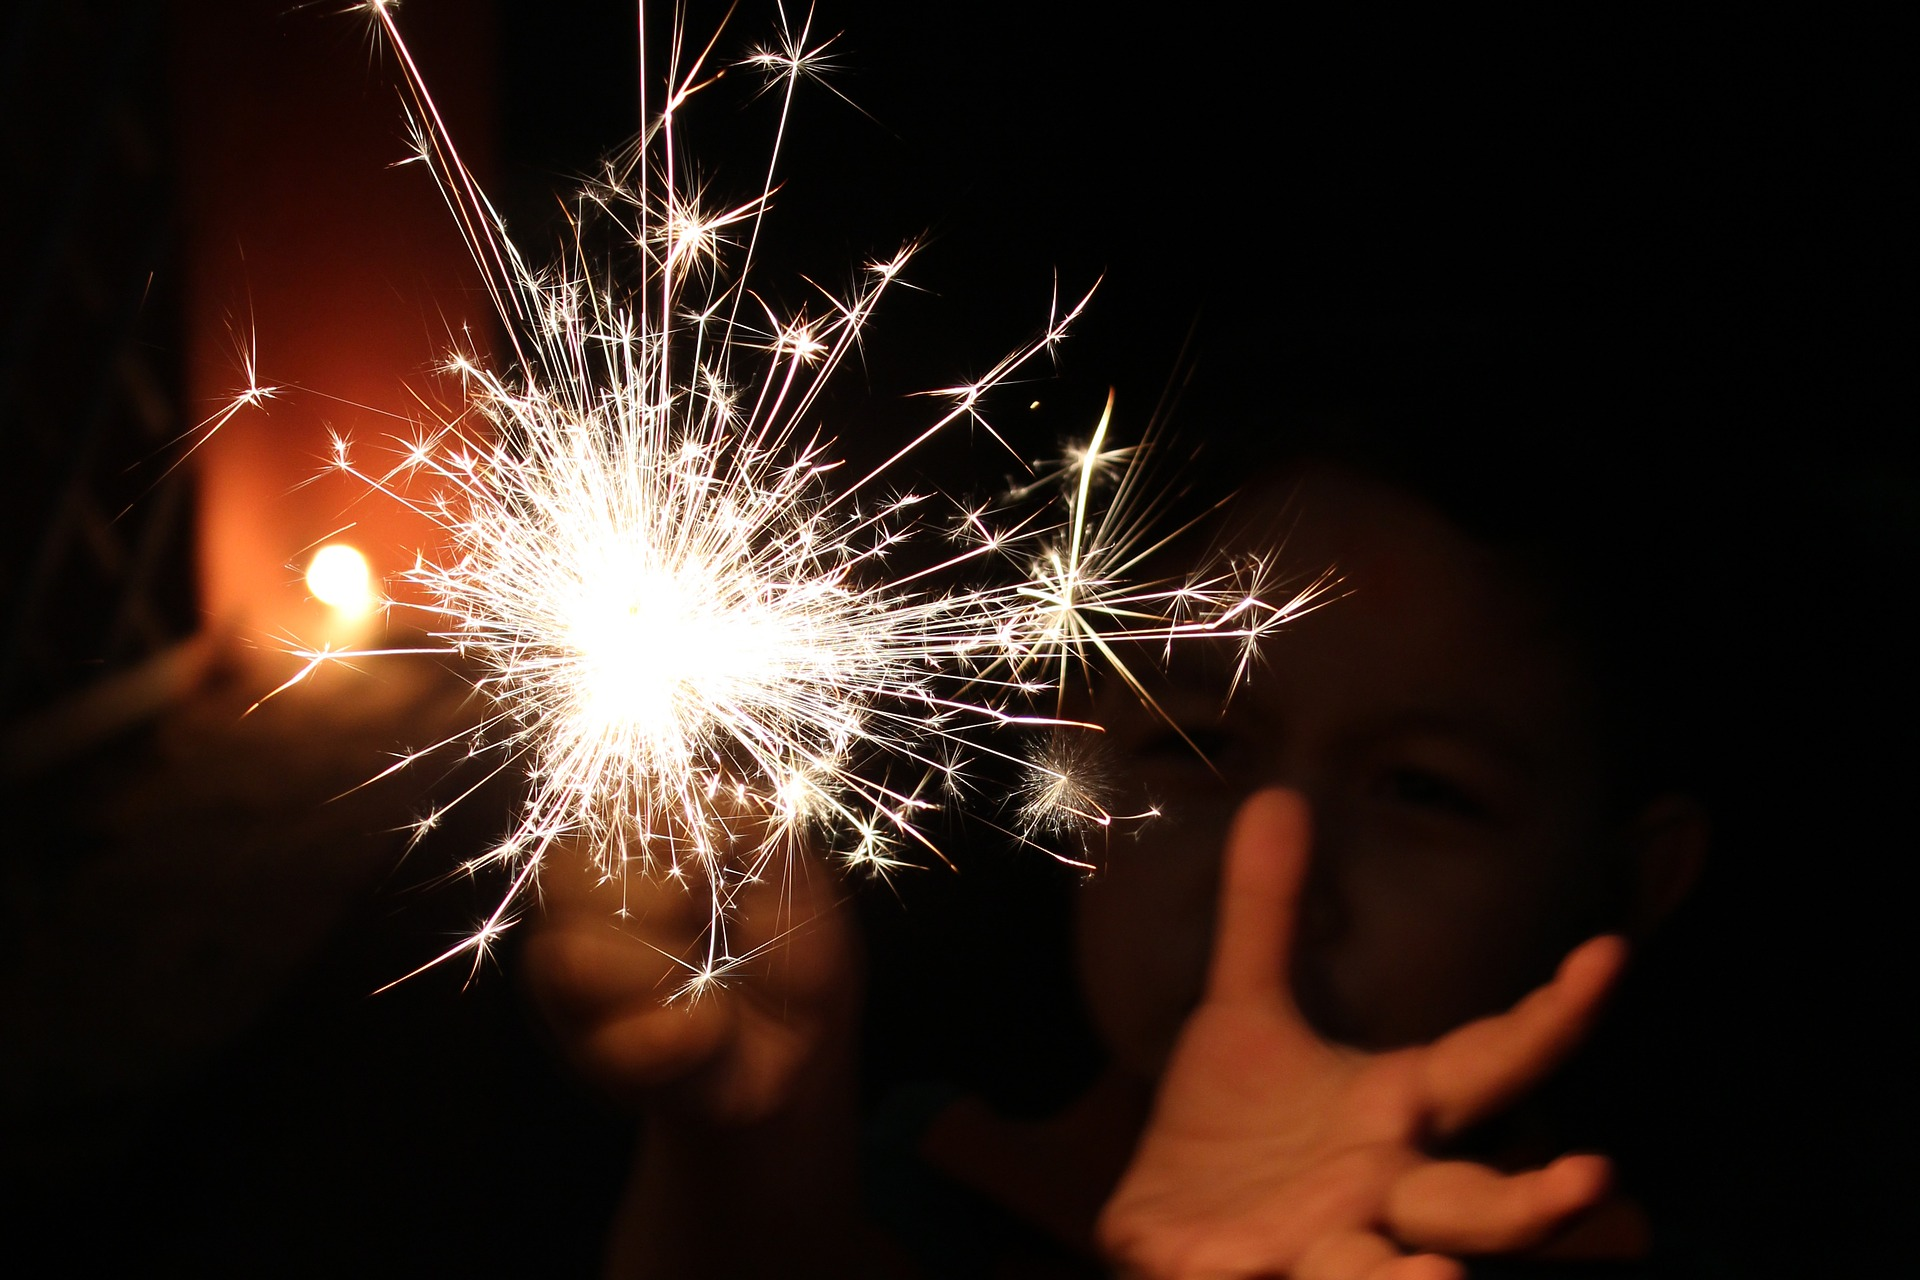 sparkler-1783630_1920